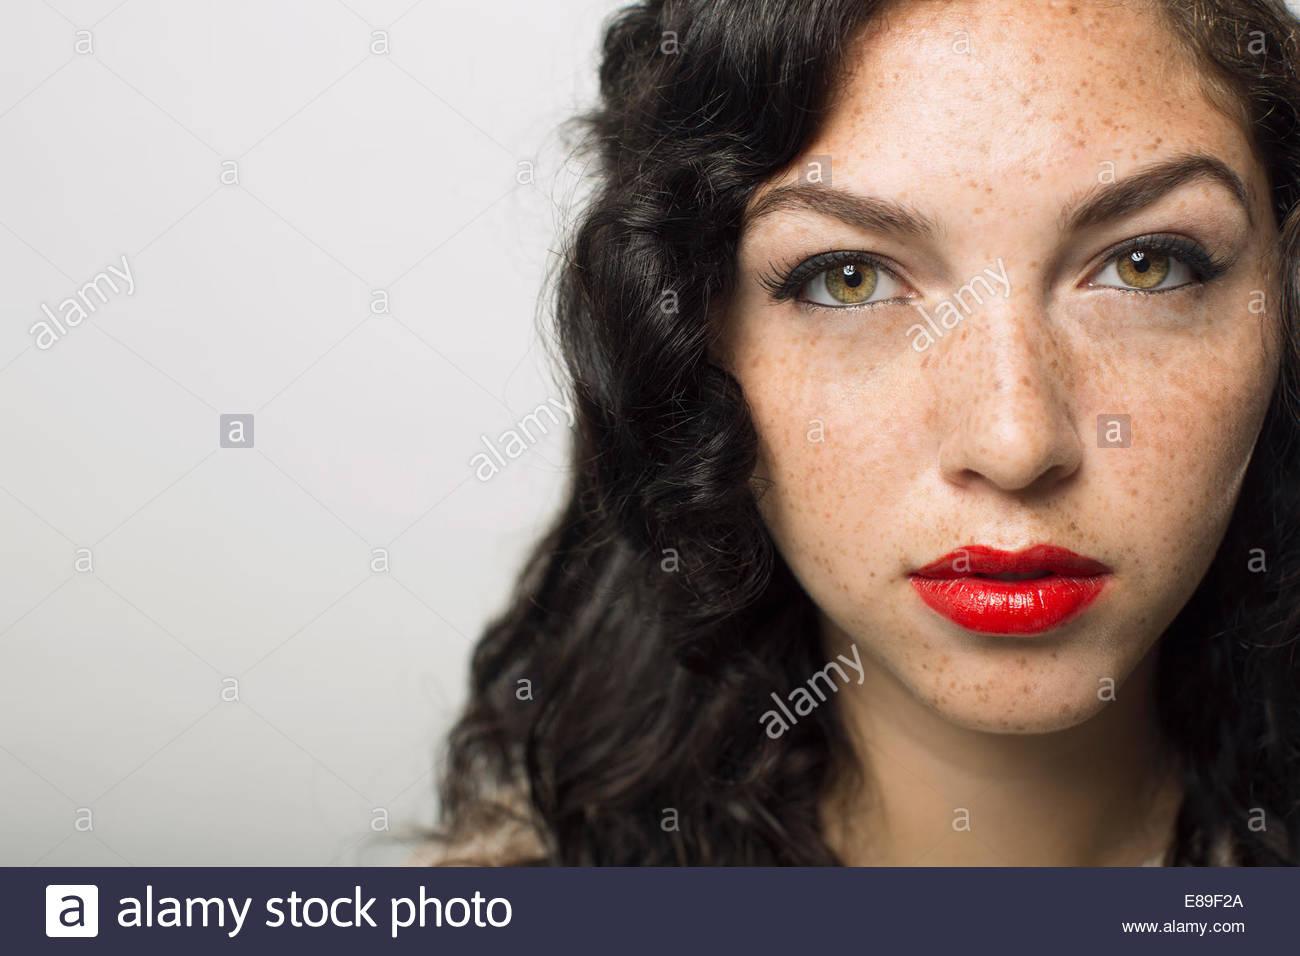 Close Up retrato de mujer seria con pecas Imagen De Stock